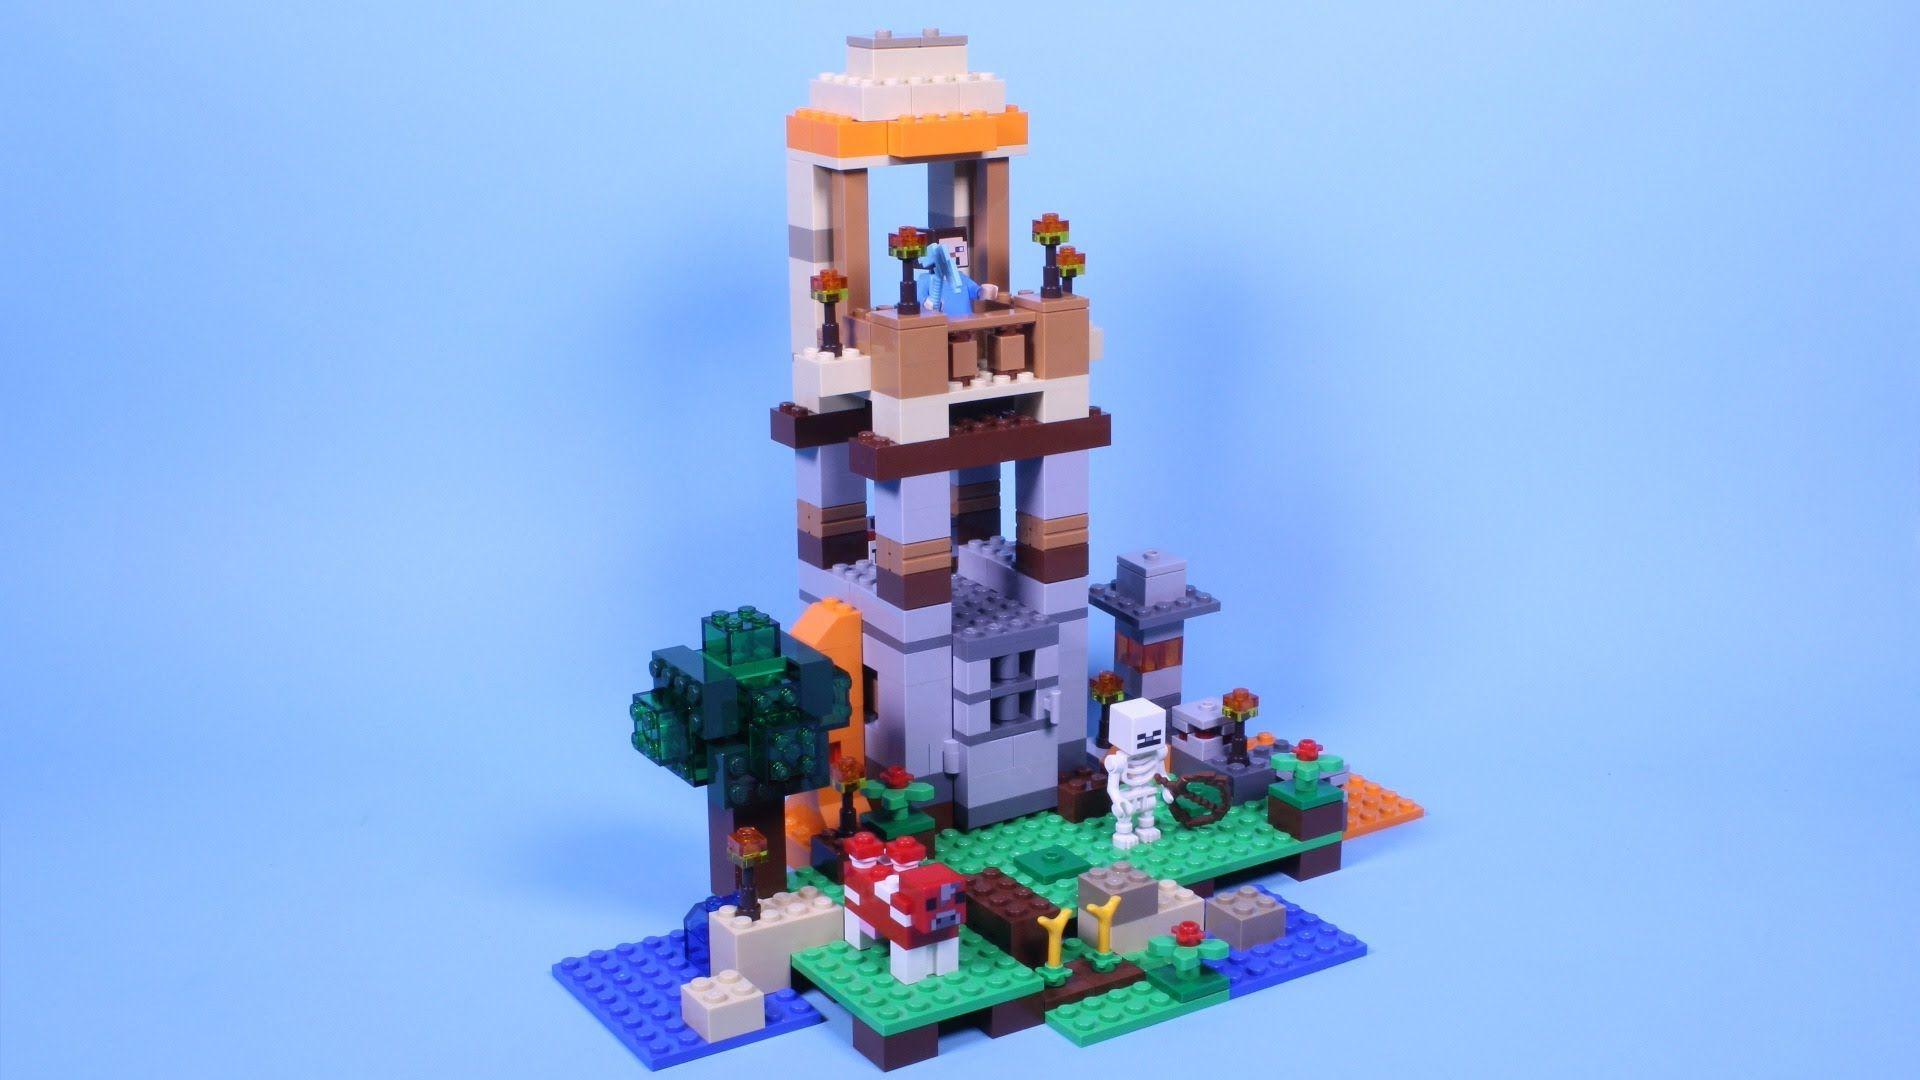 Lego Minecraft 21116 Crafting Box 8 In 1  Creation